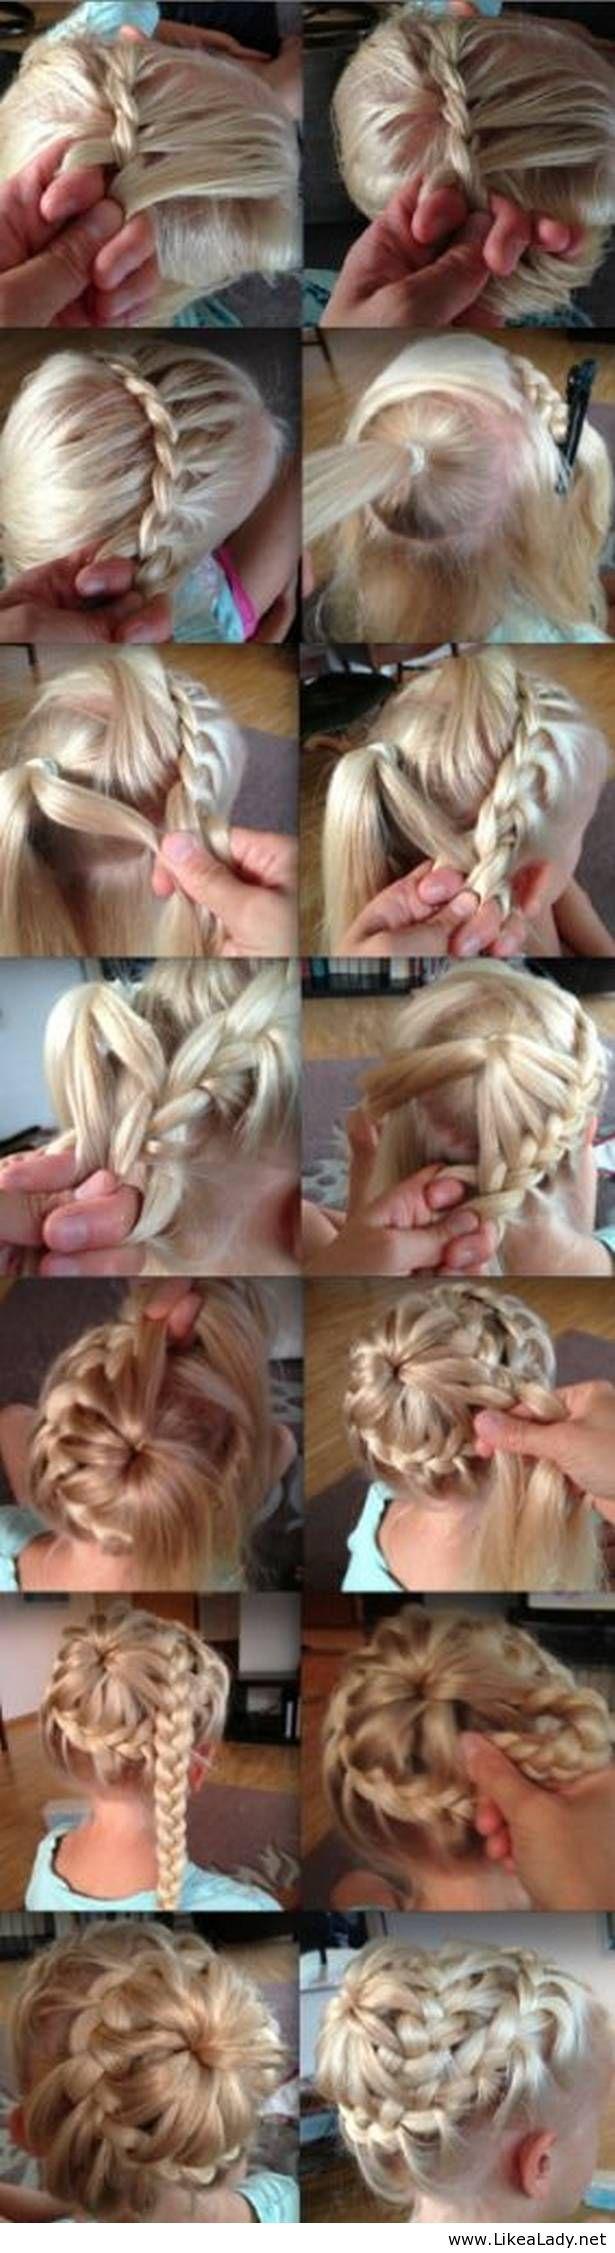 Wonderful Braided Hairstyles Step by Step Tutorial @Lisa Phillips-Barton Phillips-Barton Phillips-Barton Phillips-Barton Phillips-Barton Phillips-Barton Johnson- Knot & Veil